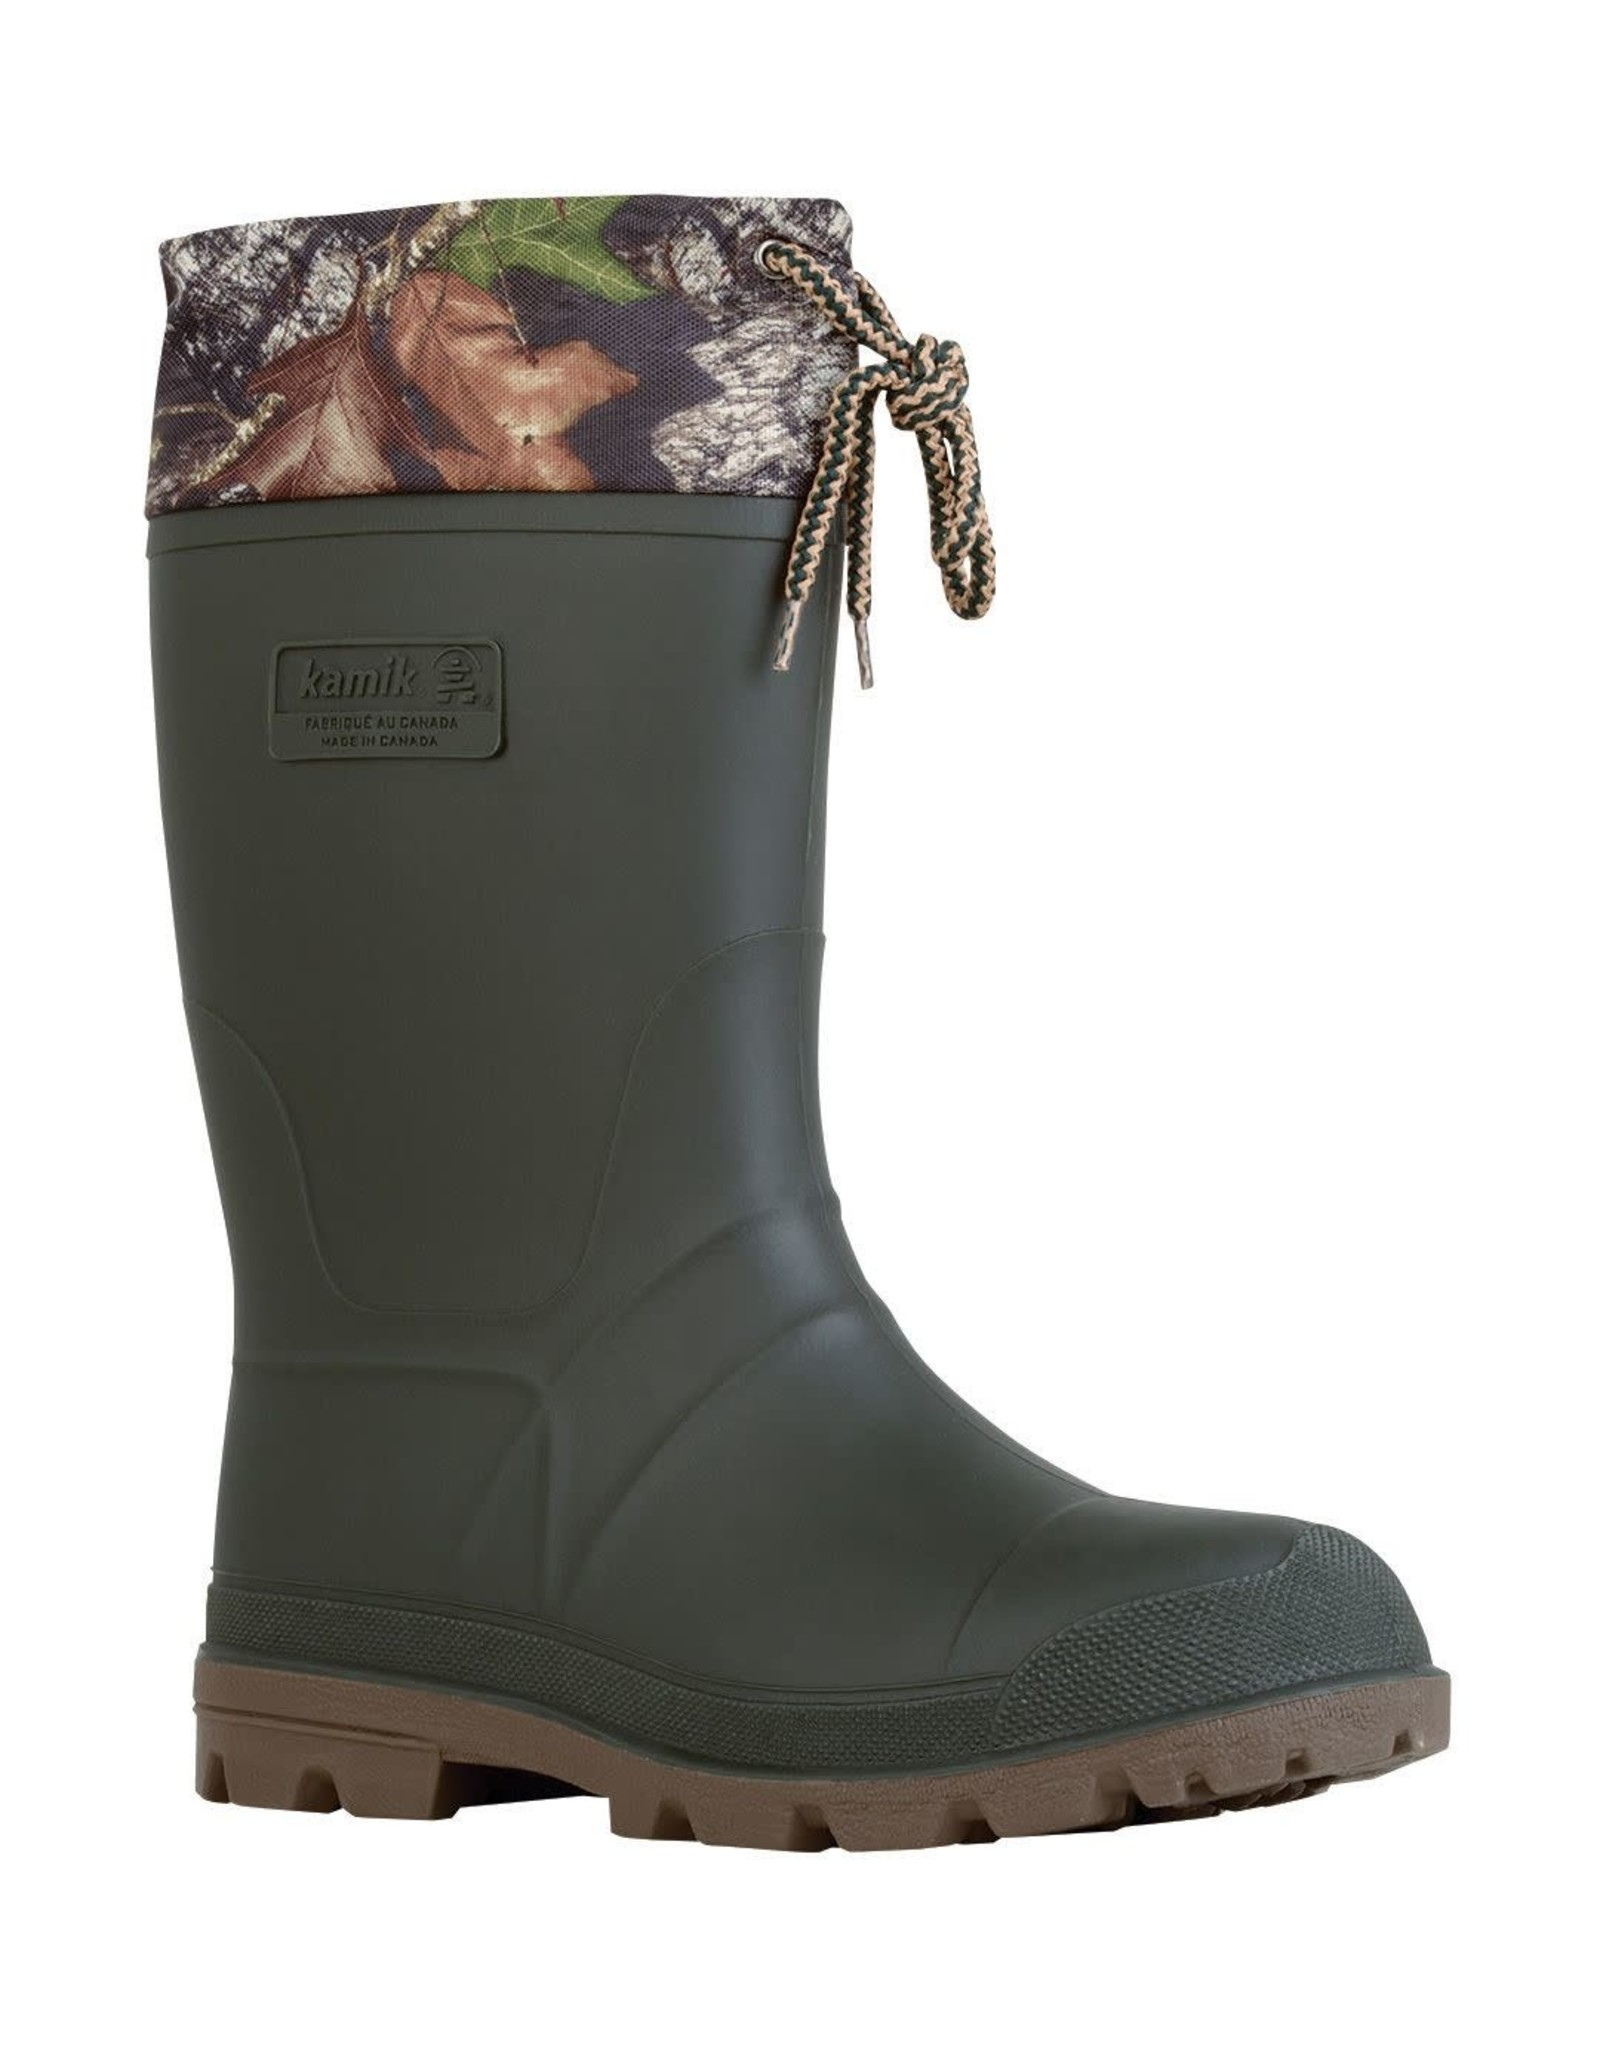 Kamik Kamik Icebreaker - Lined Boots - Camo - Size 7